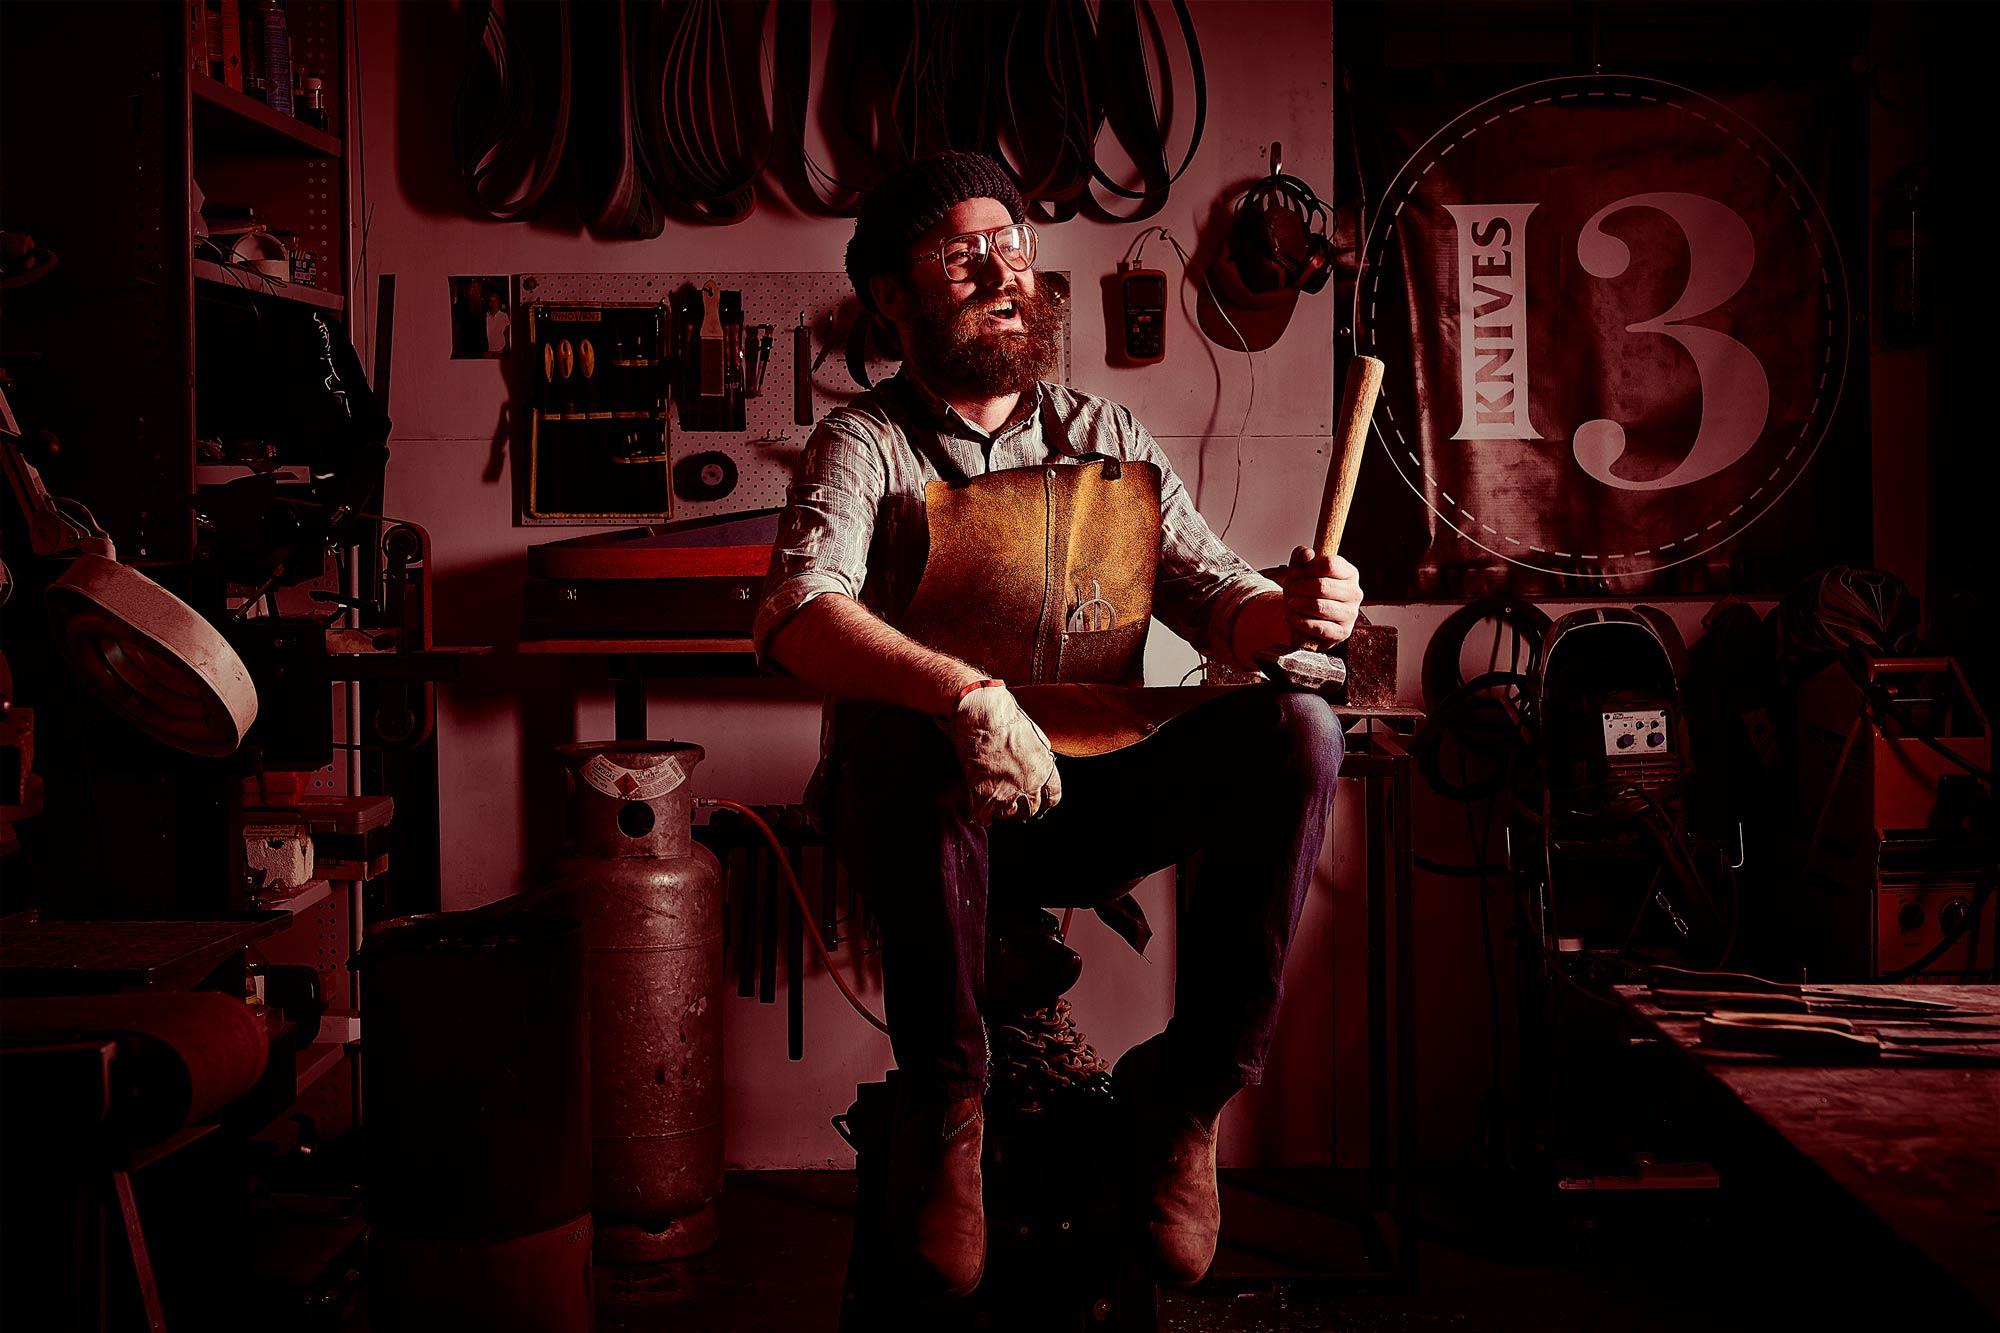 Bud Heyser - 13 Knives - Knife maker - Photo by Laurence James